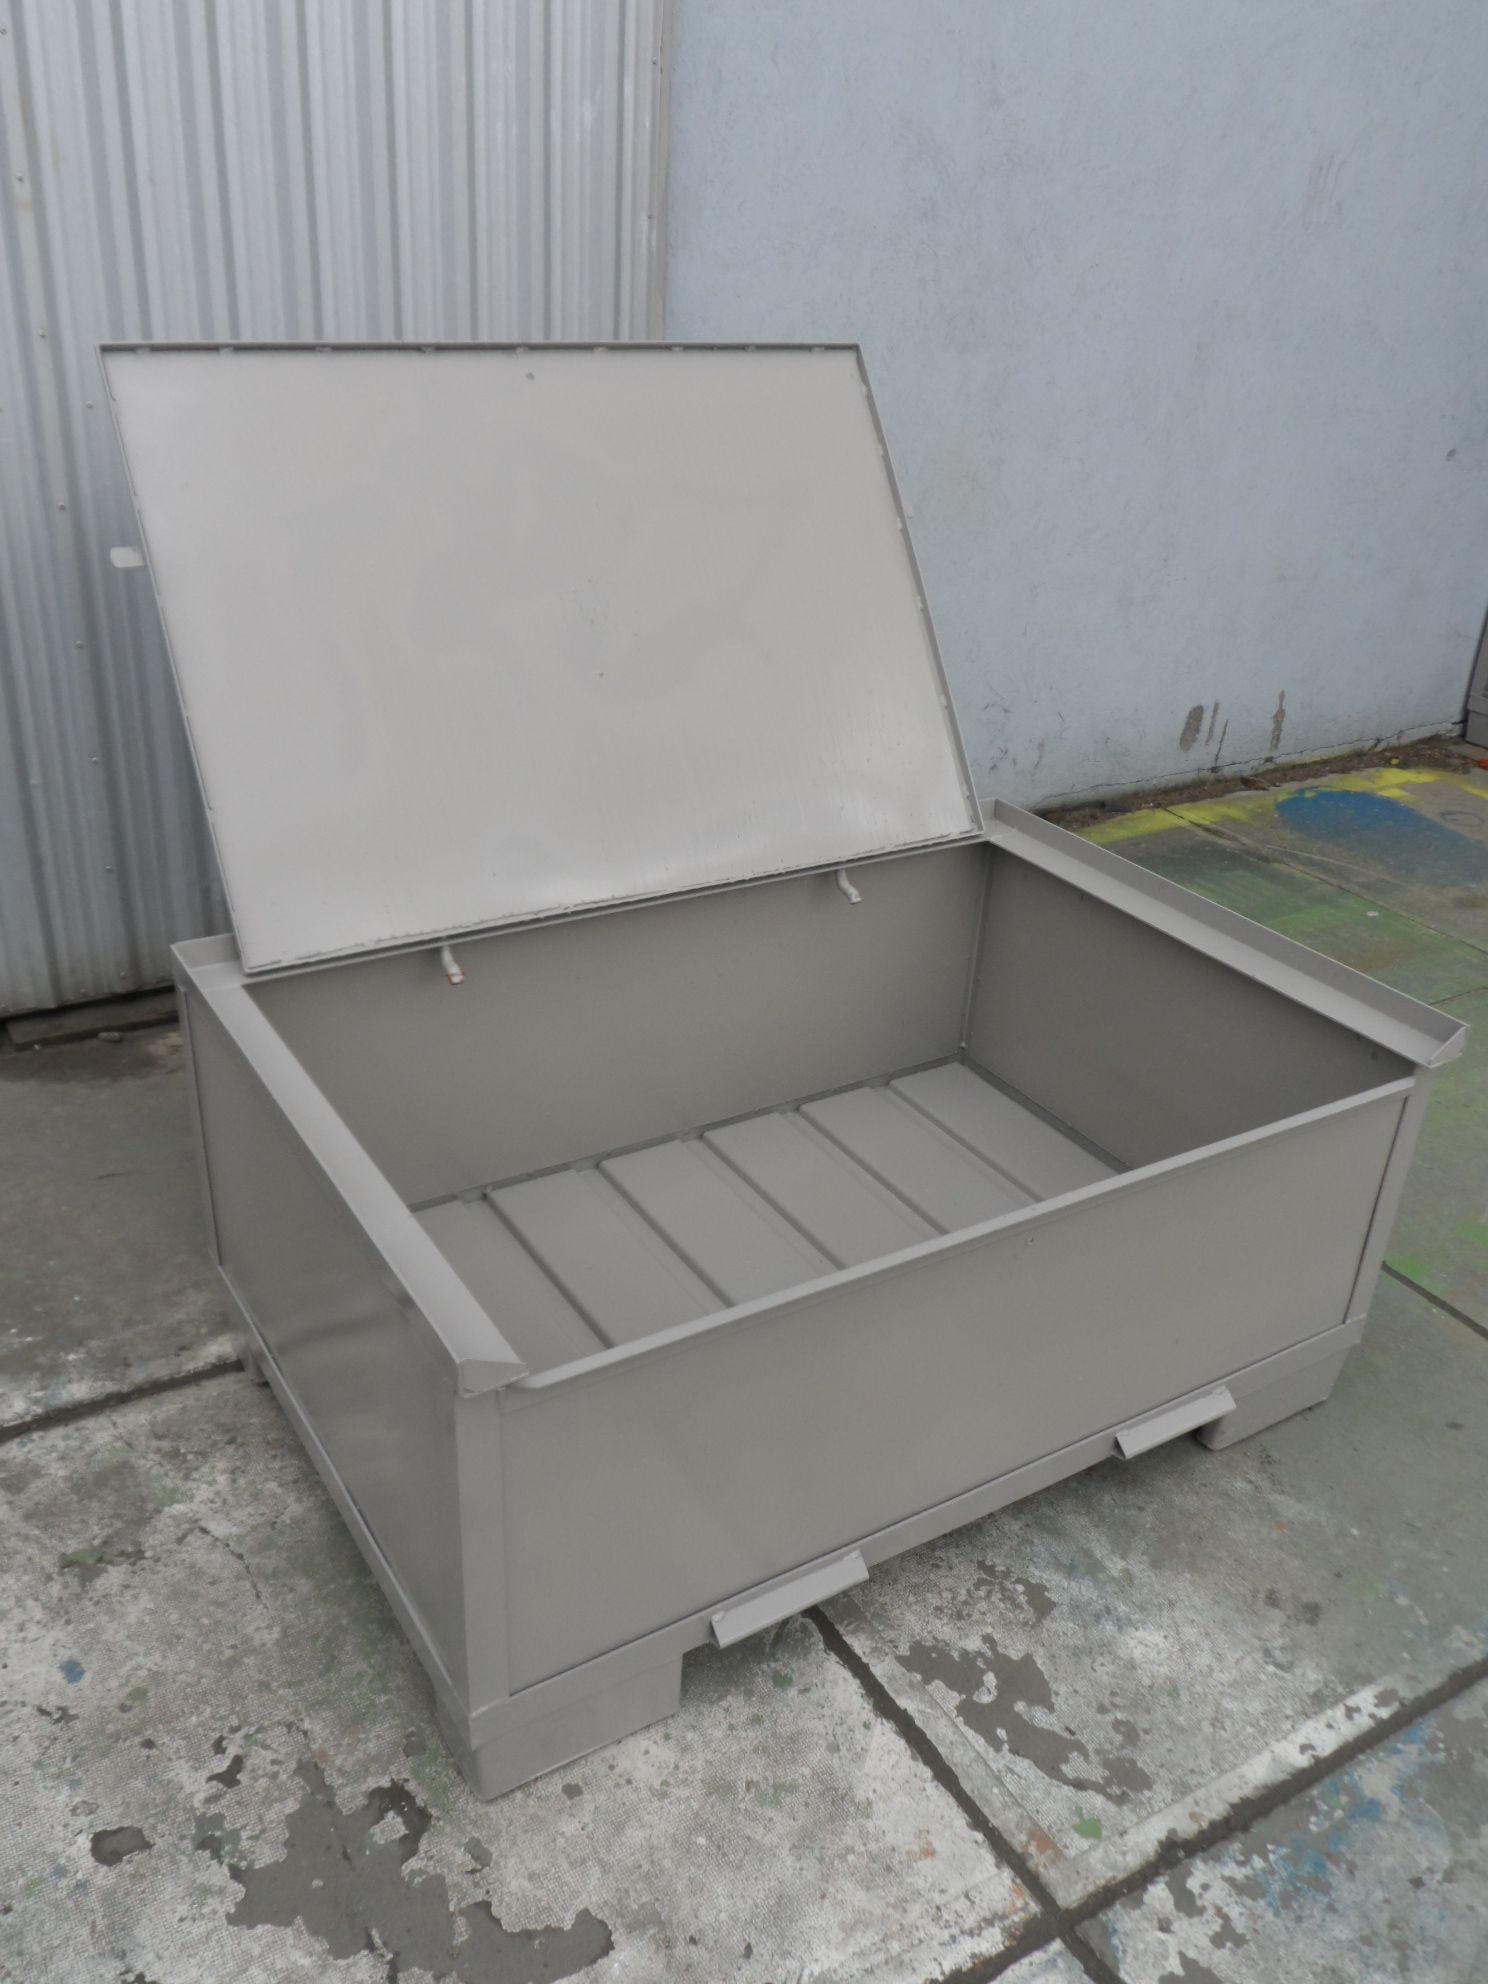 Set - Stahlbehälter H57-MS3 + Stahldeckel, neu-0